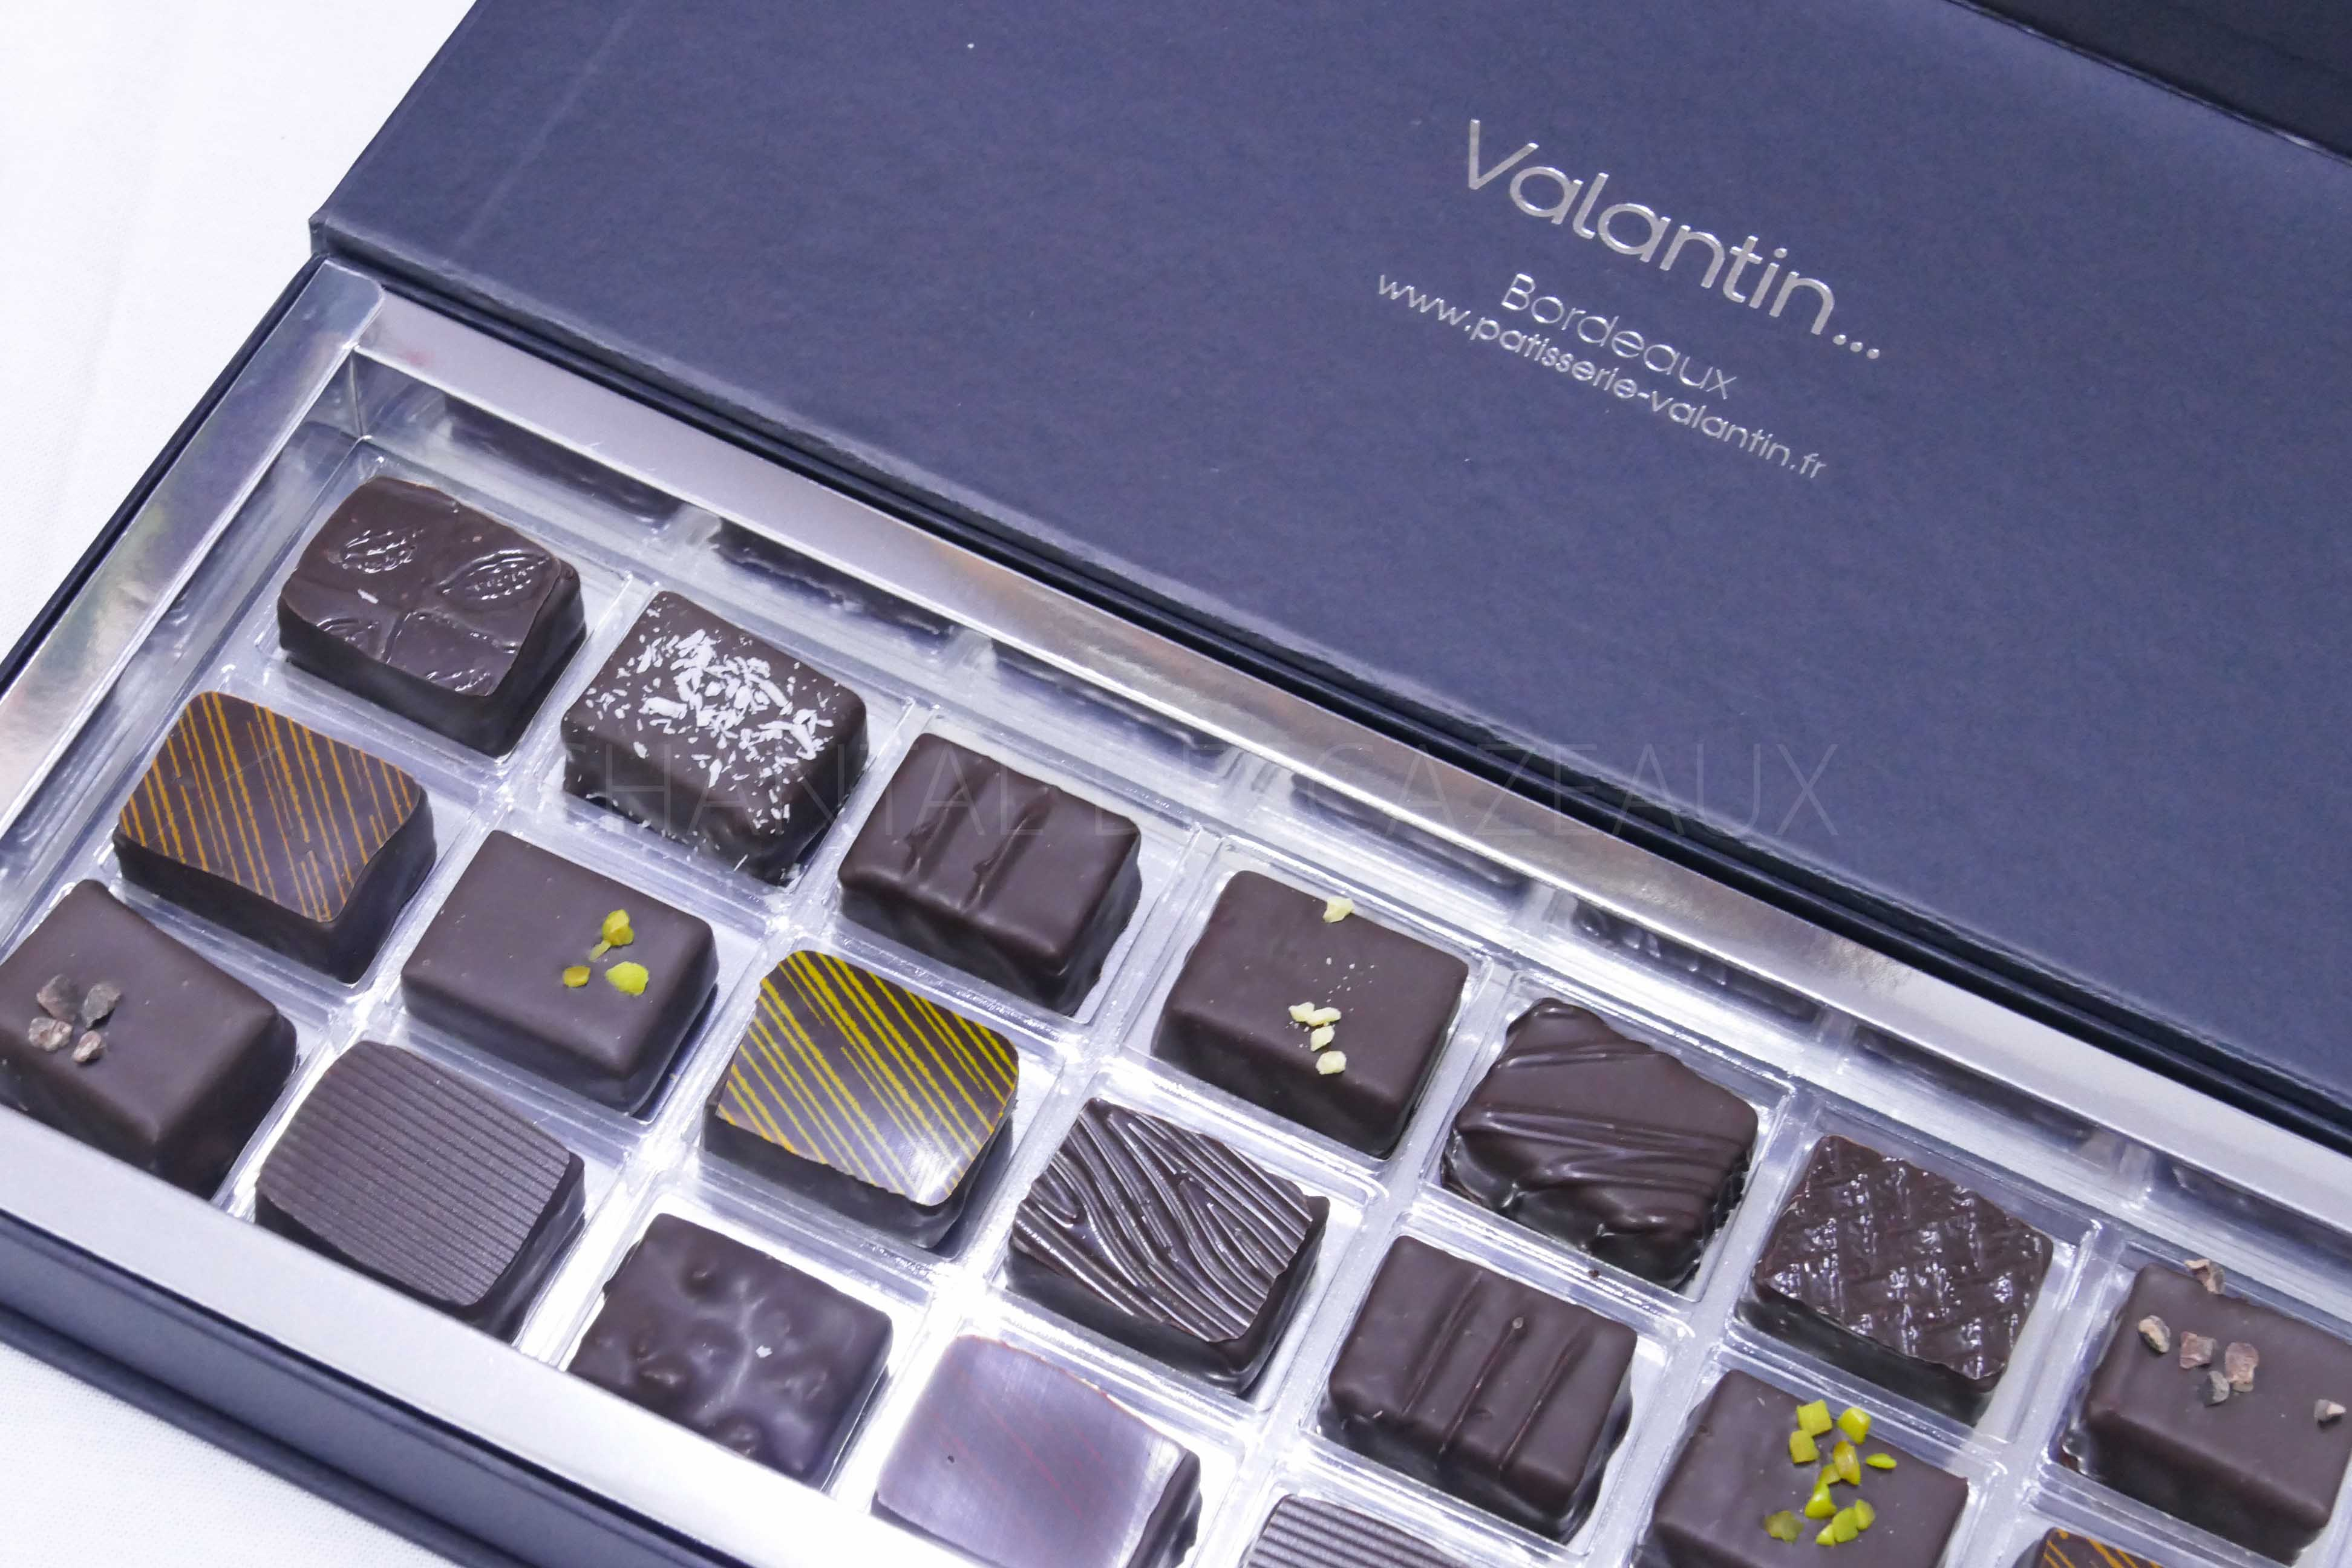 choclats Noël Valantin